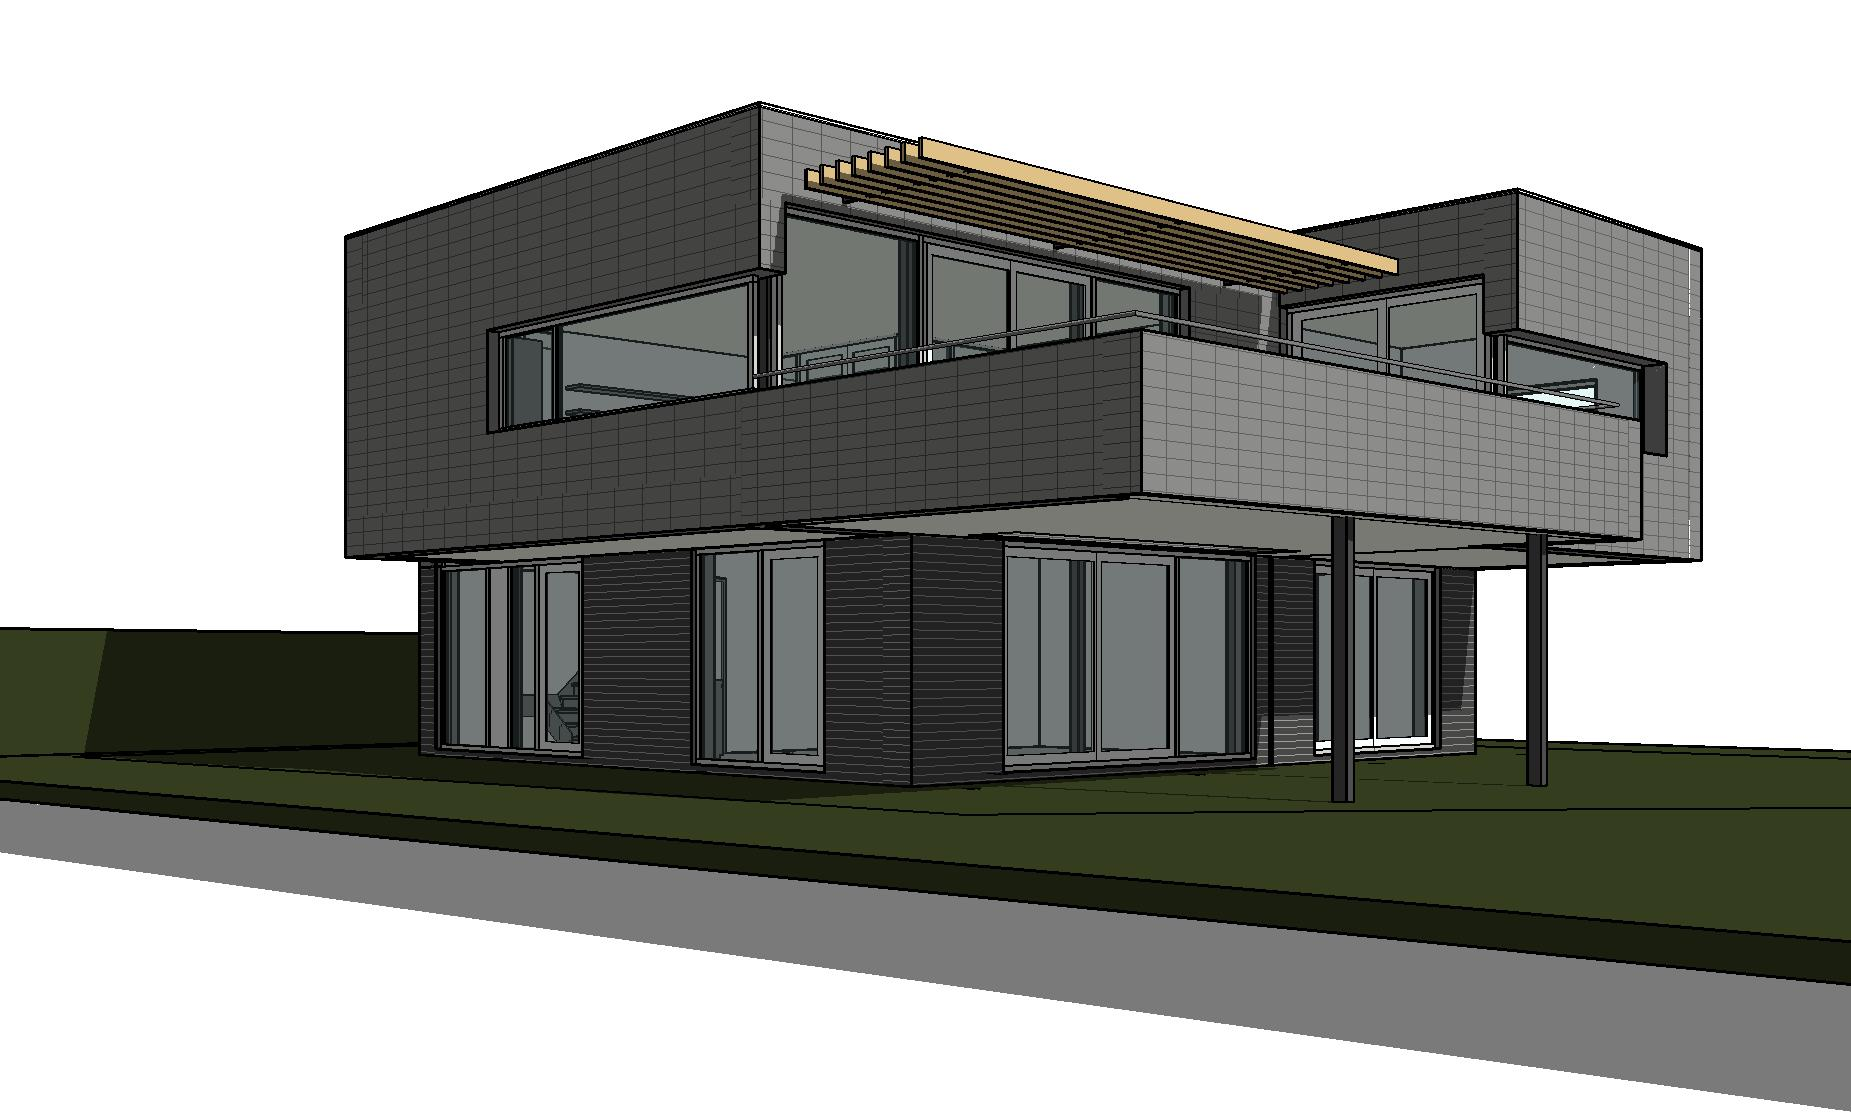 Moderne villa in plan vaart alkmaar nico dekker ontwerp bouwkunde - Moderne uitbreiding huis ...